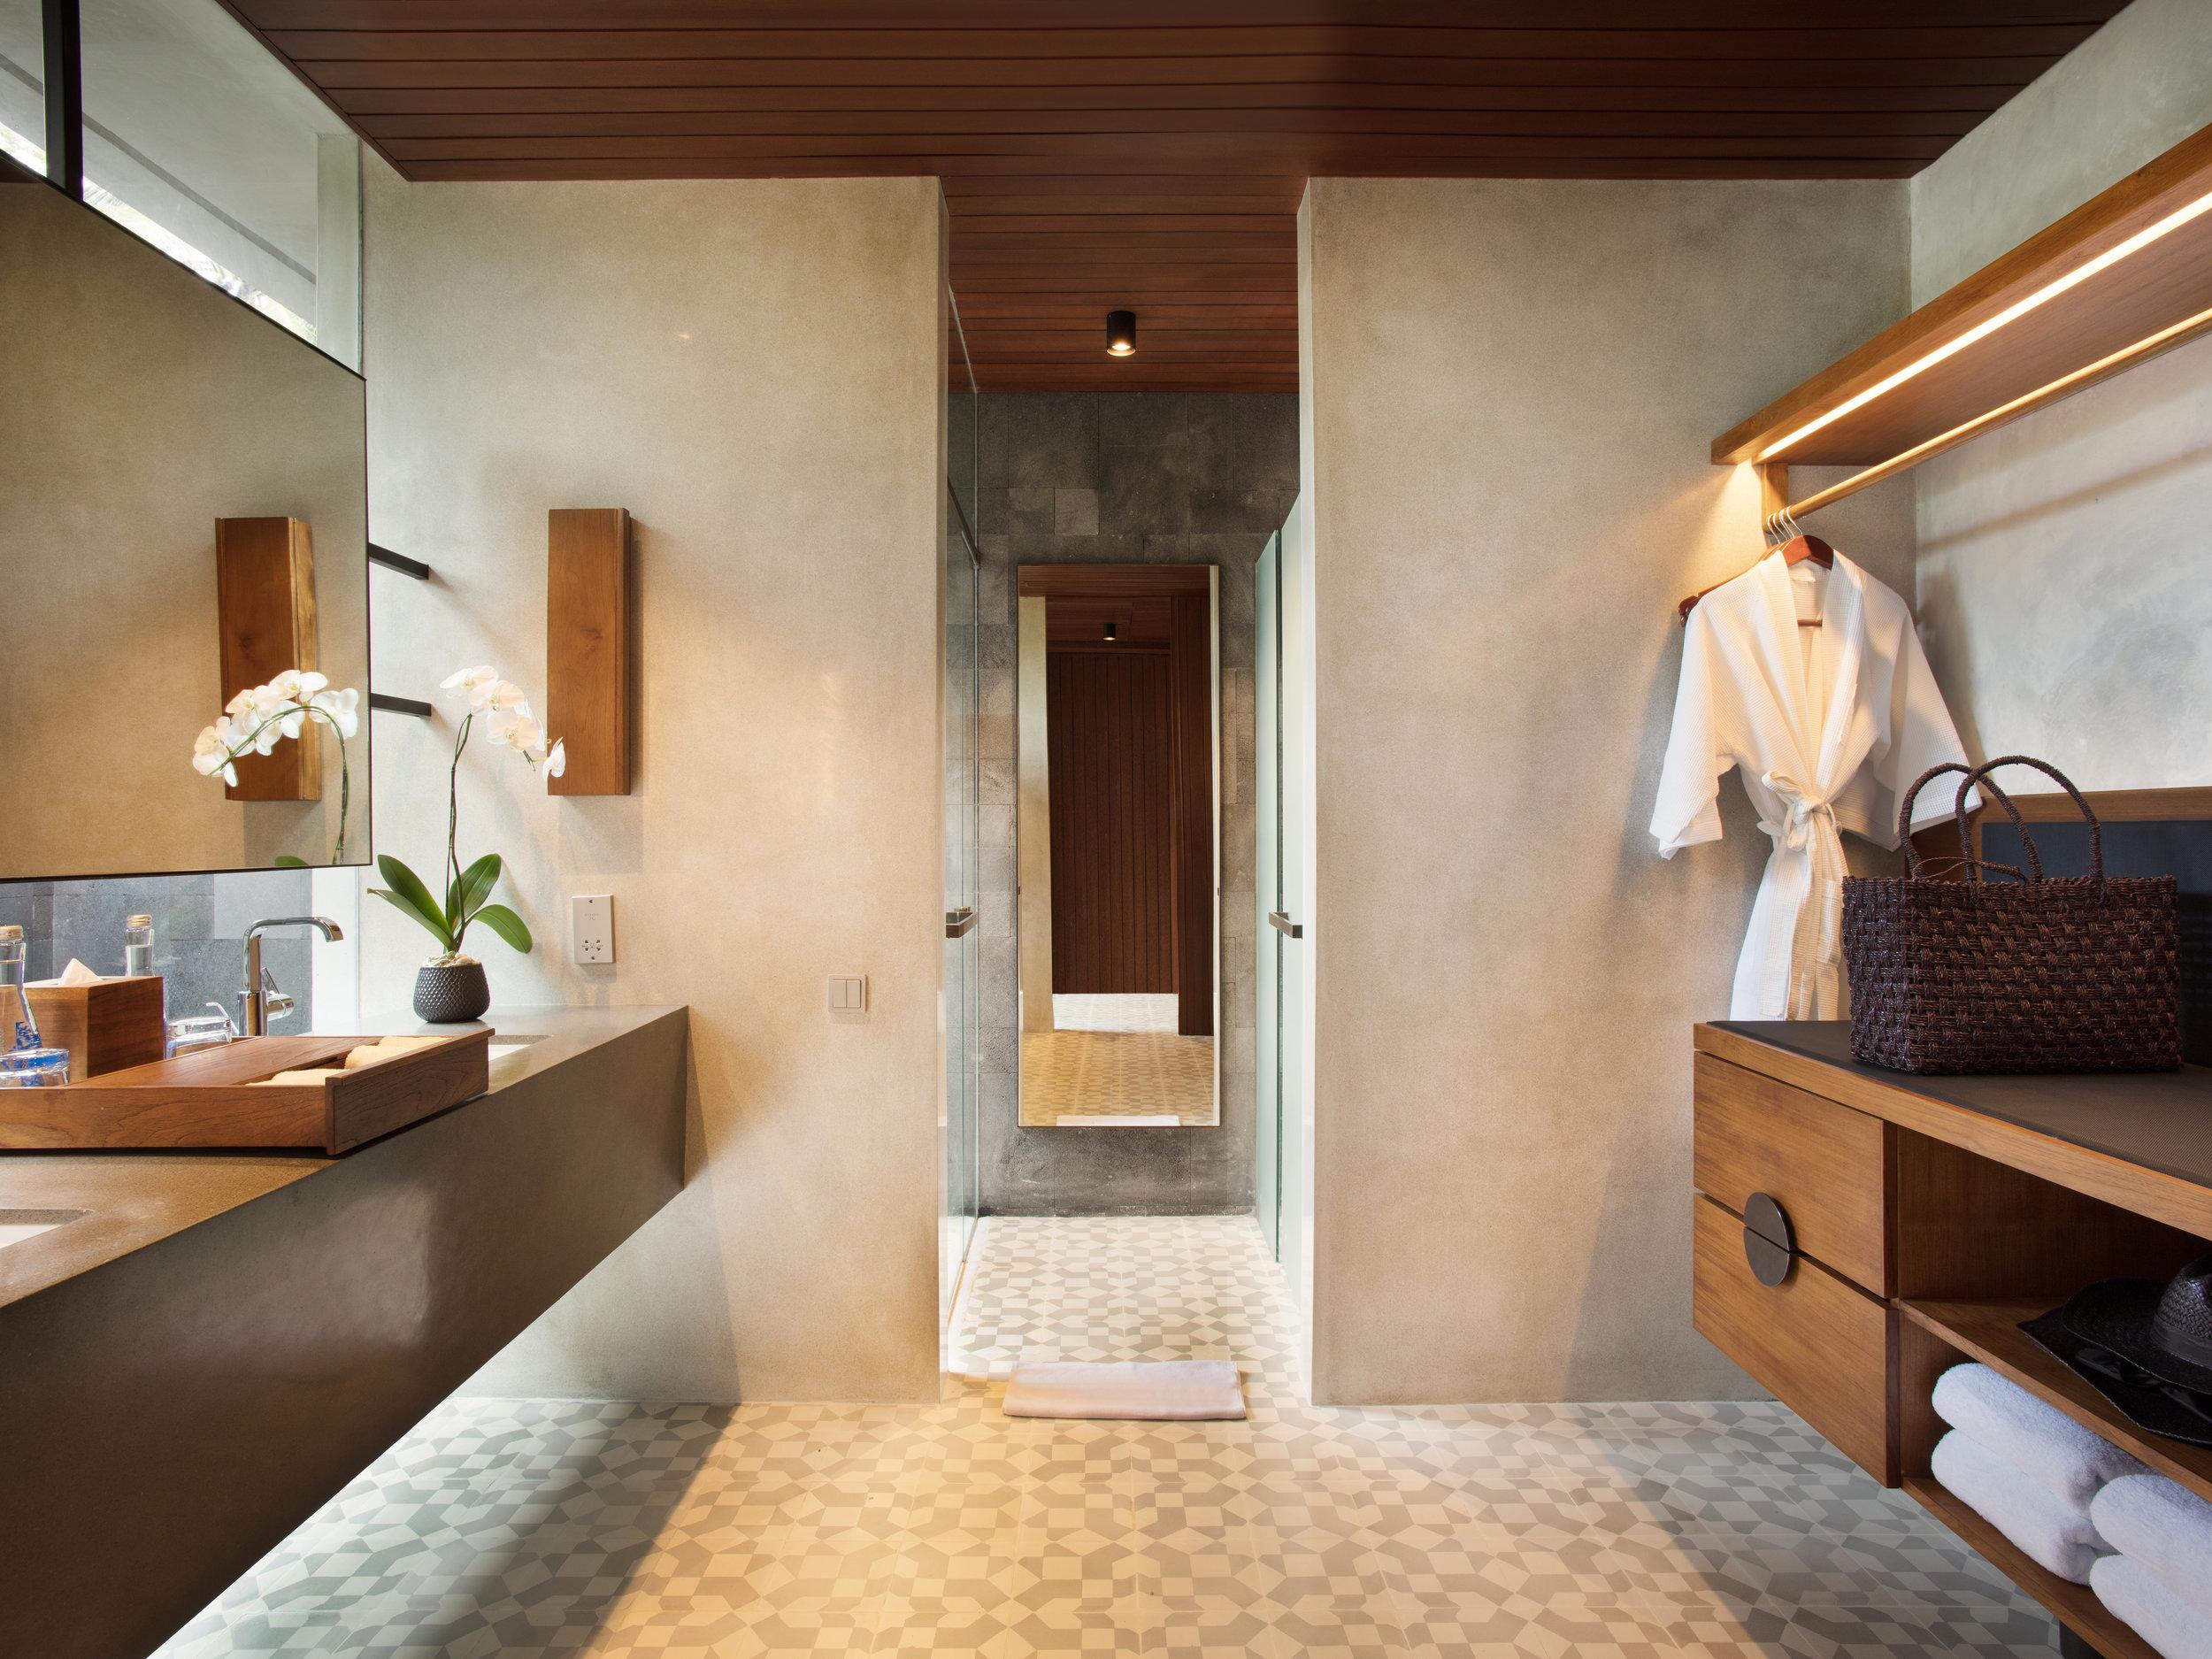 Alila Ubud - Accommodation - New Terrace Tree Villa - Bathroom1.jpg